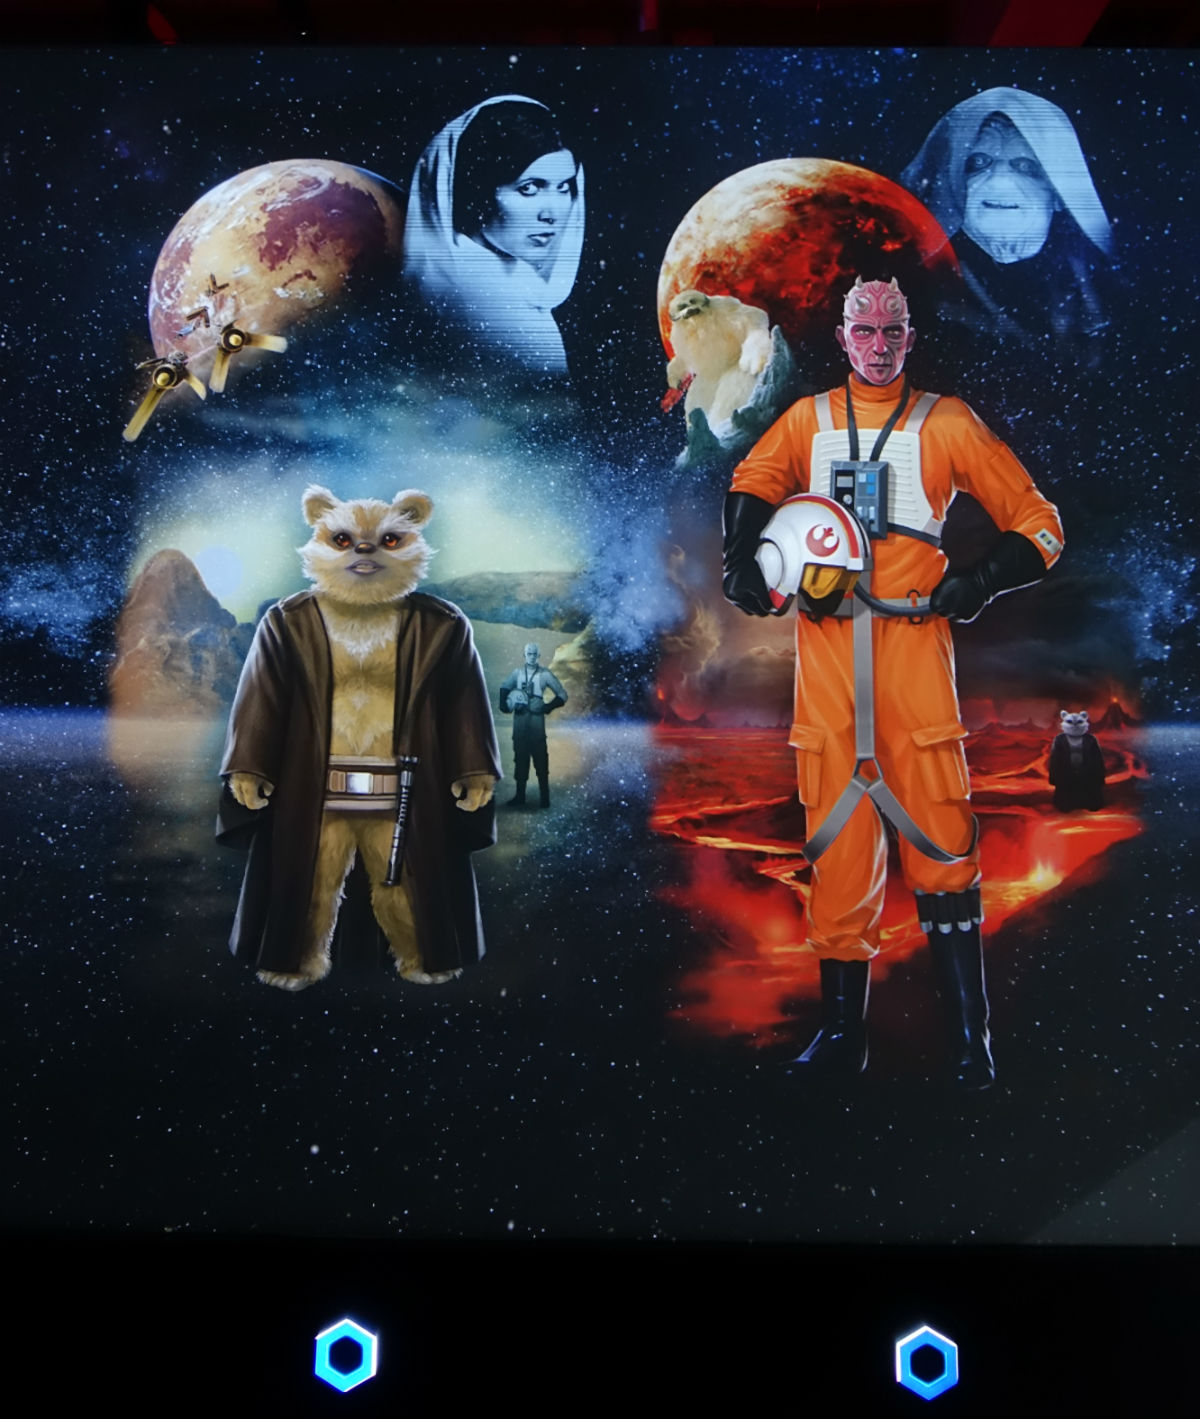 Star Wars Identities Japan 出来上がったキャラクター投影 2キャラ